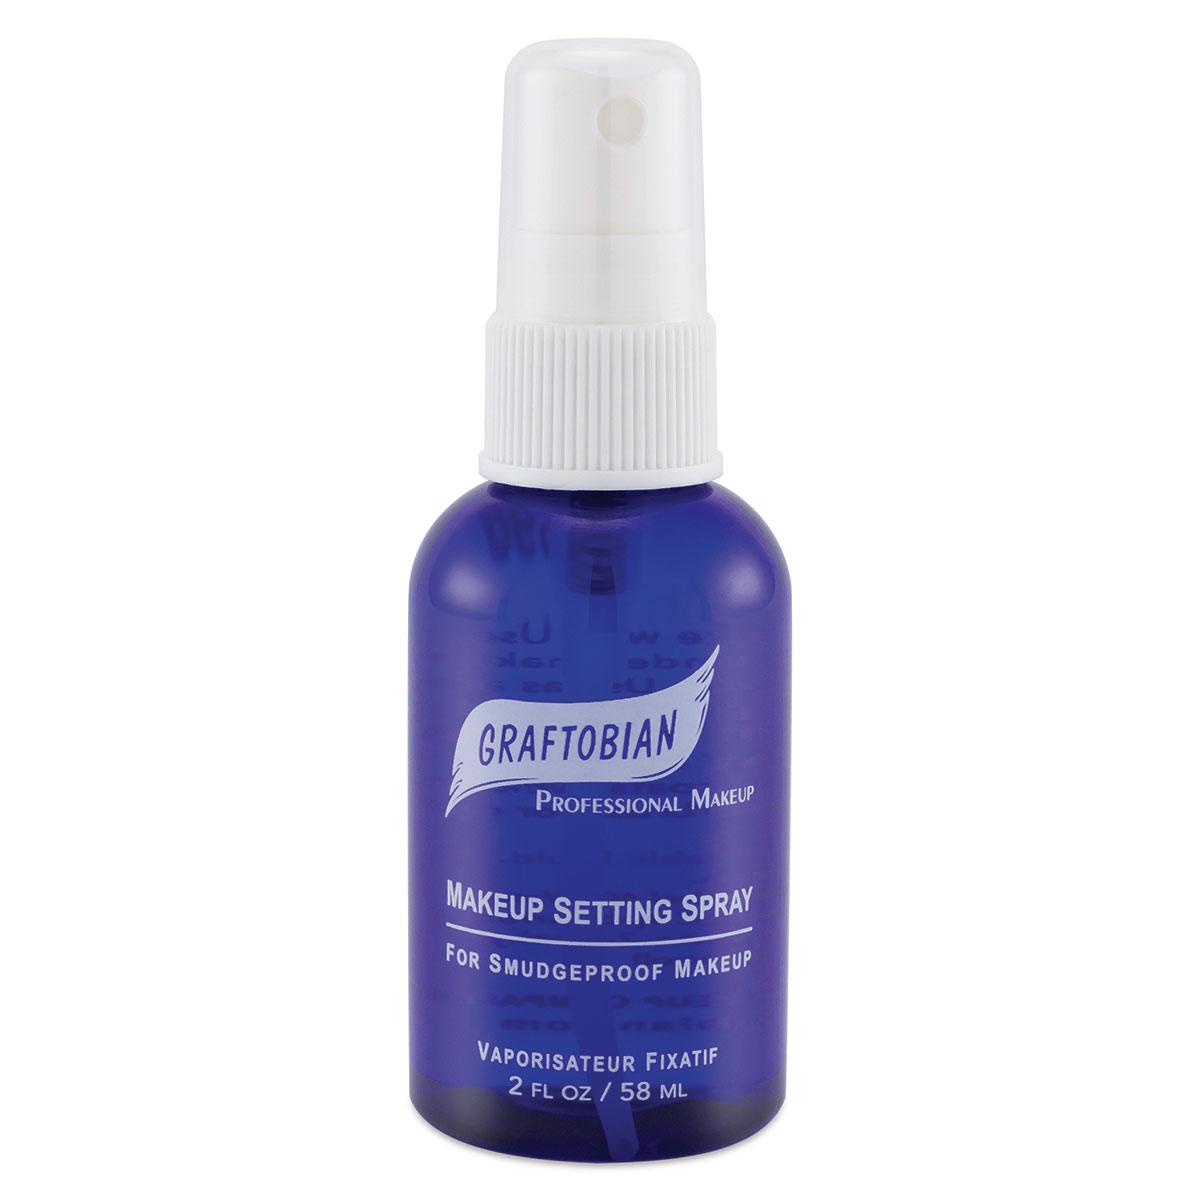 Graftobian Makeup Setting Spray